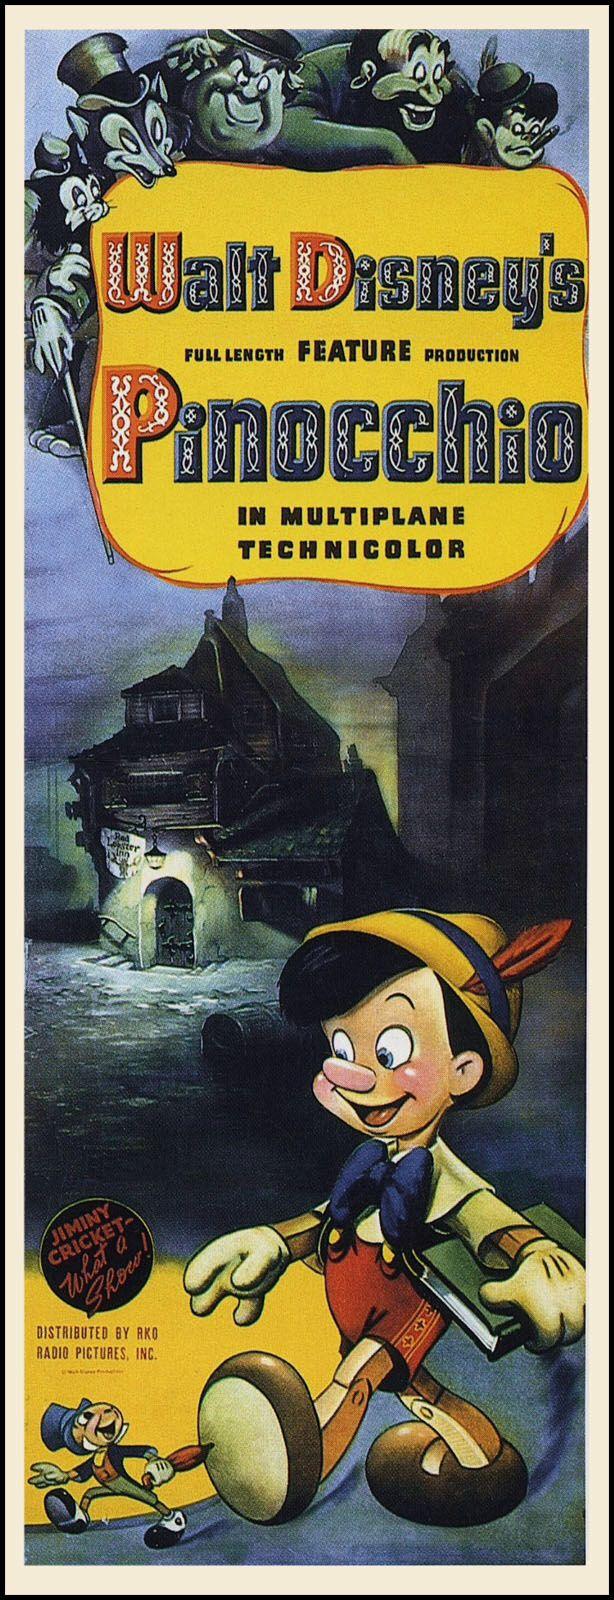 Movie Poster. Walt Disney's Pinocchio (1940) high art